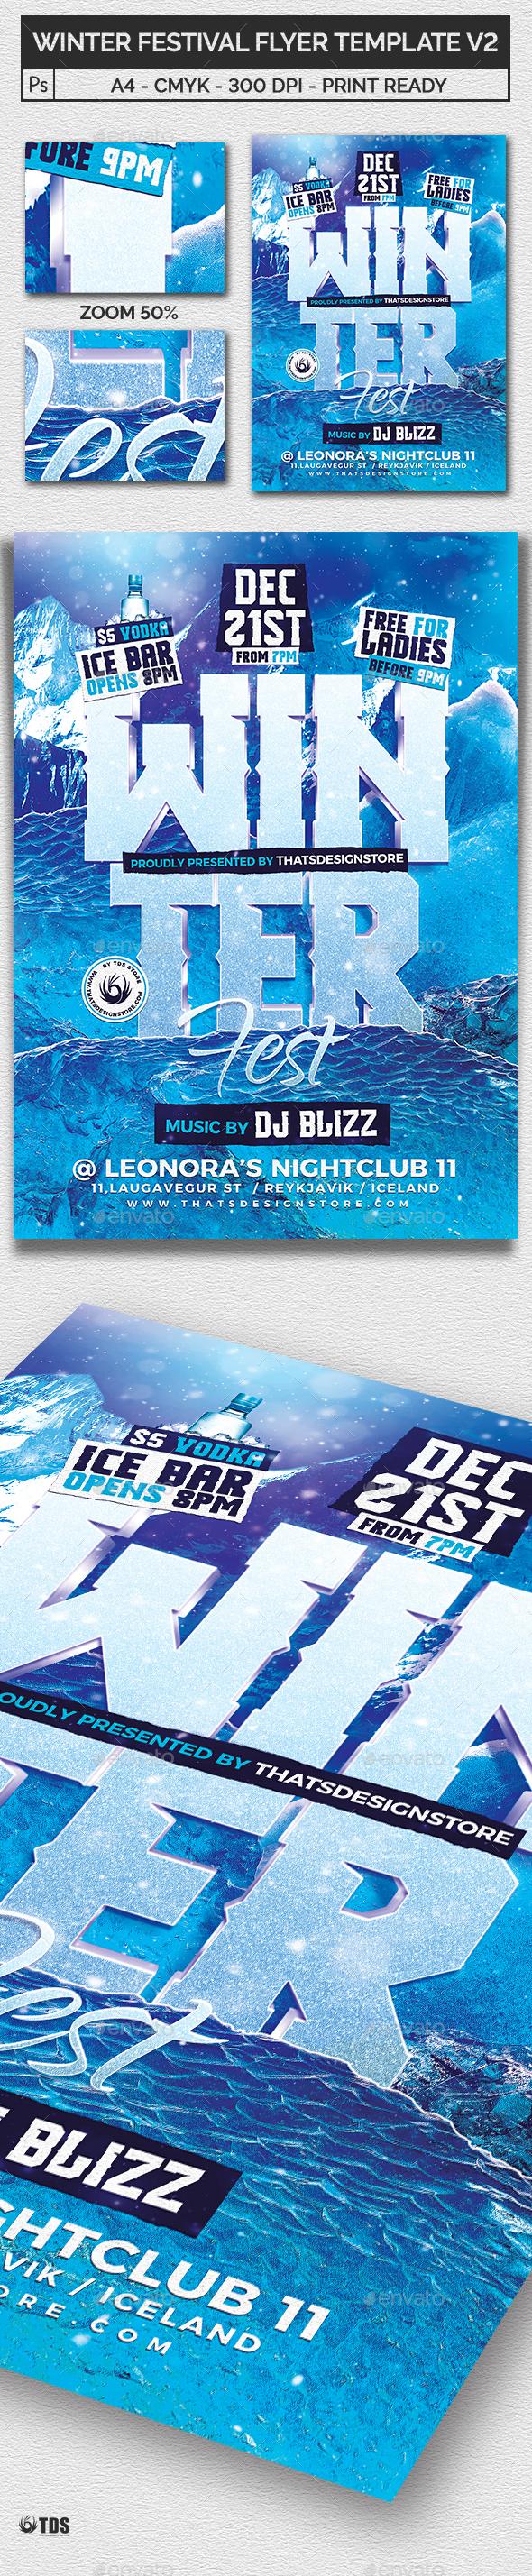 GraphicRiver Winter Festival Flyer Template V2 21097907